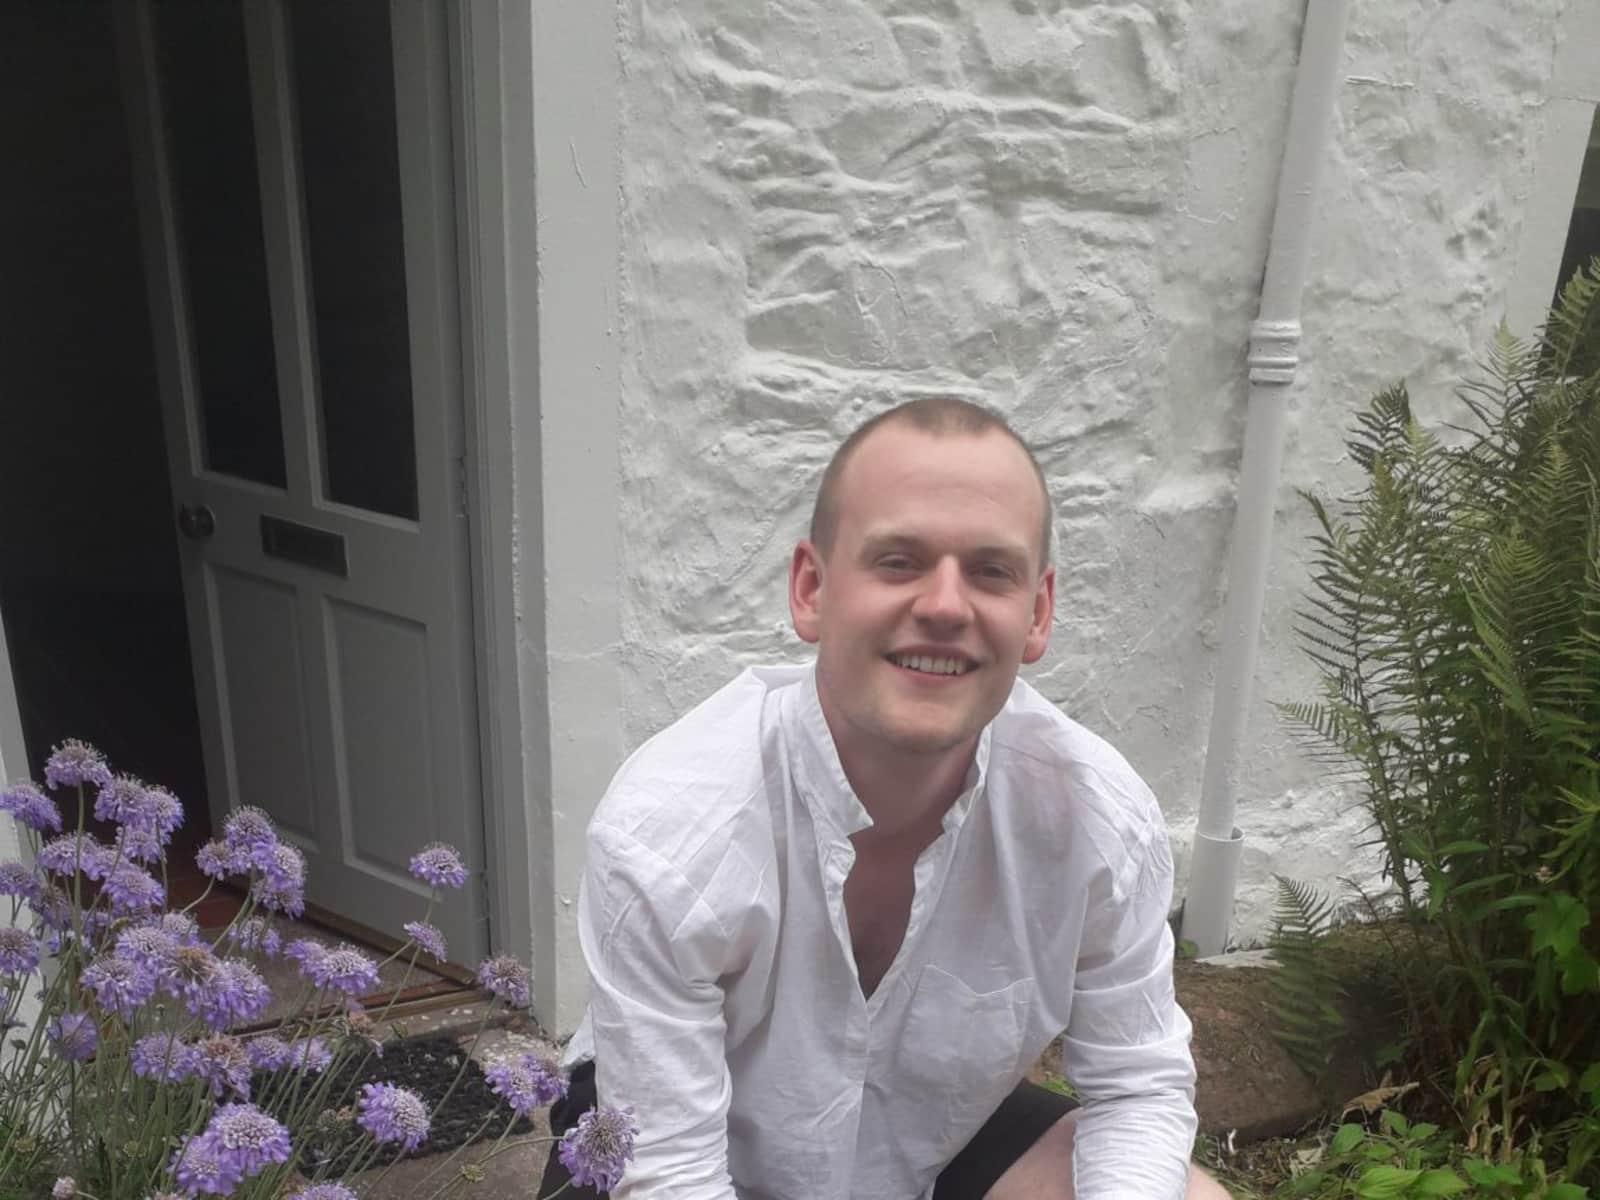 Angus blair from Glasgow, United Kingdom